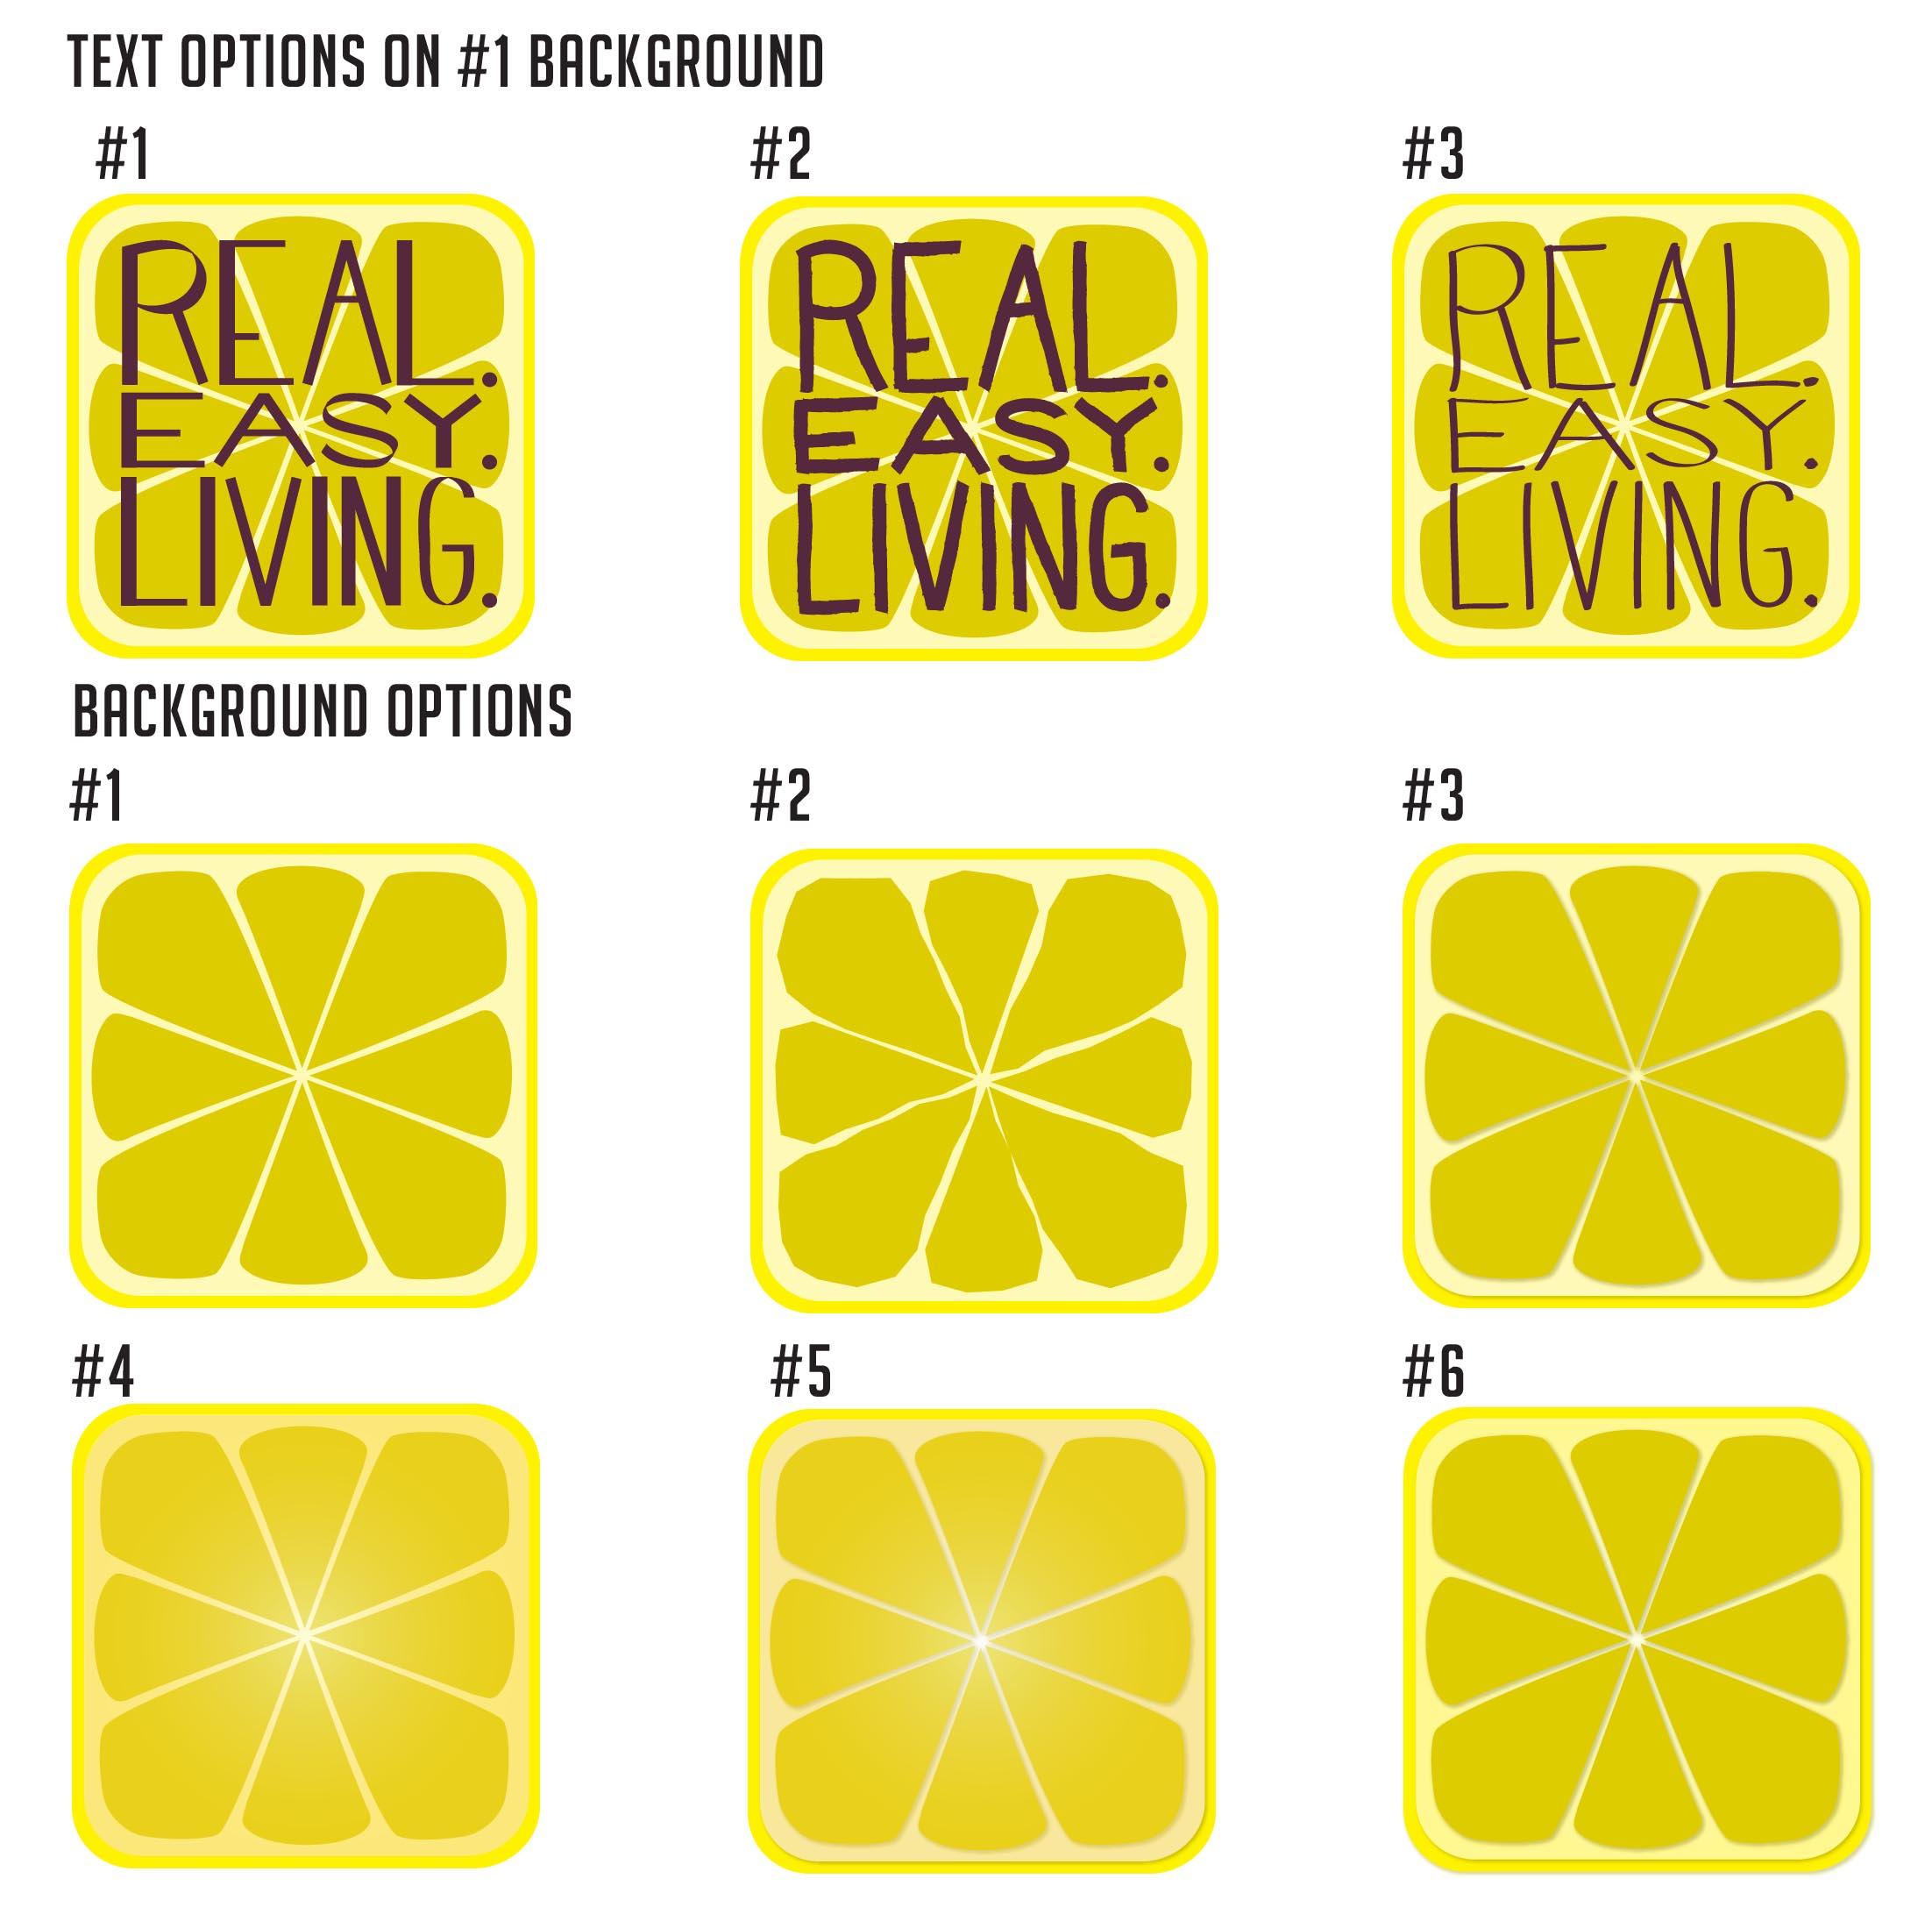 R-E-L-Options